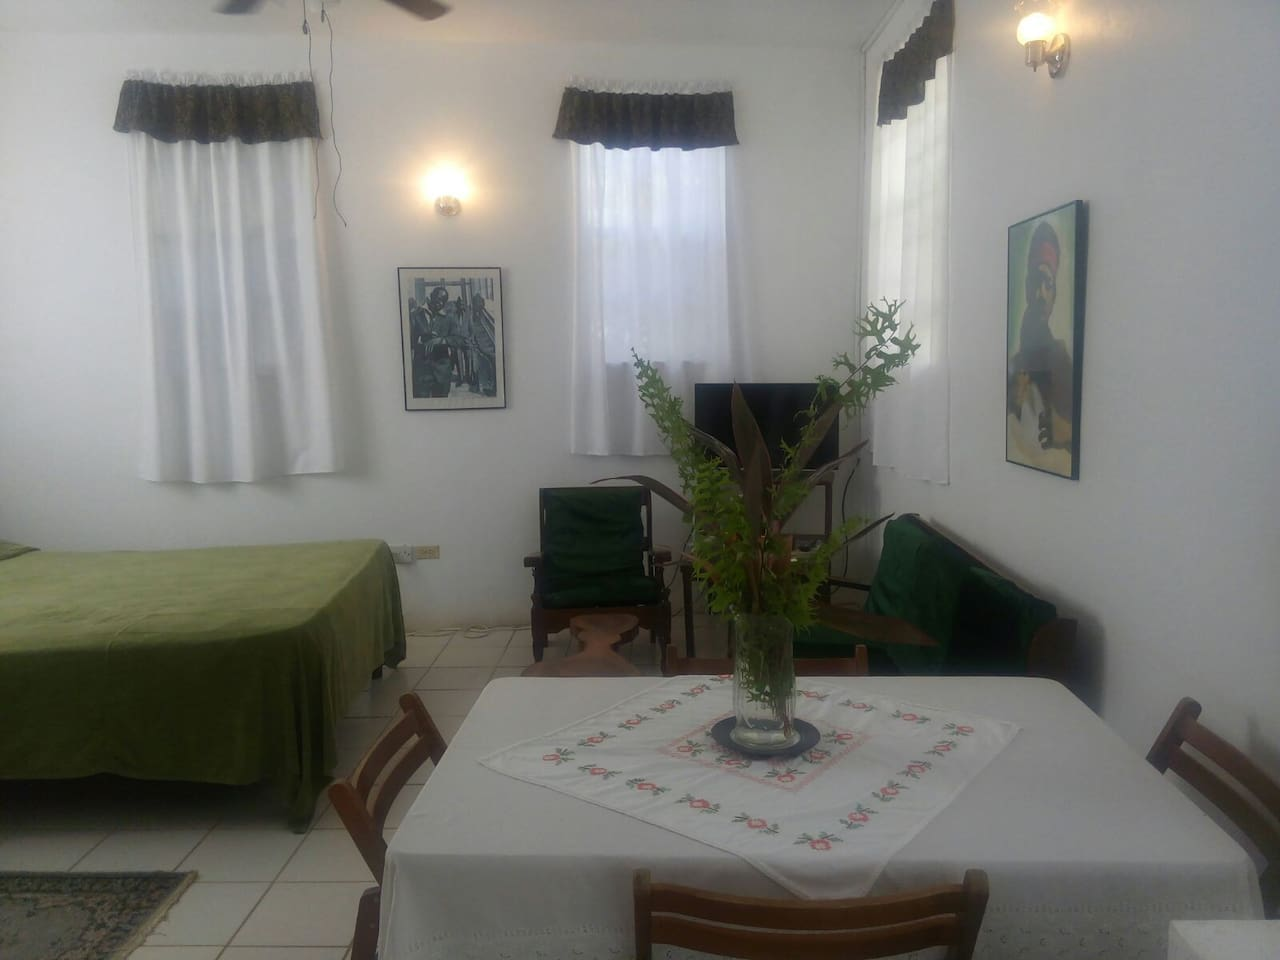 Unit two, room, table corner